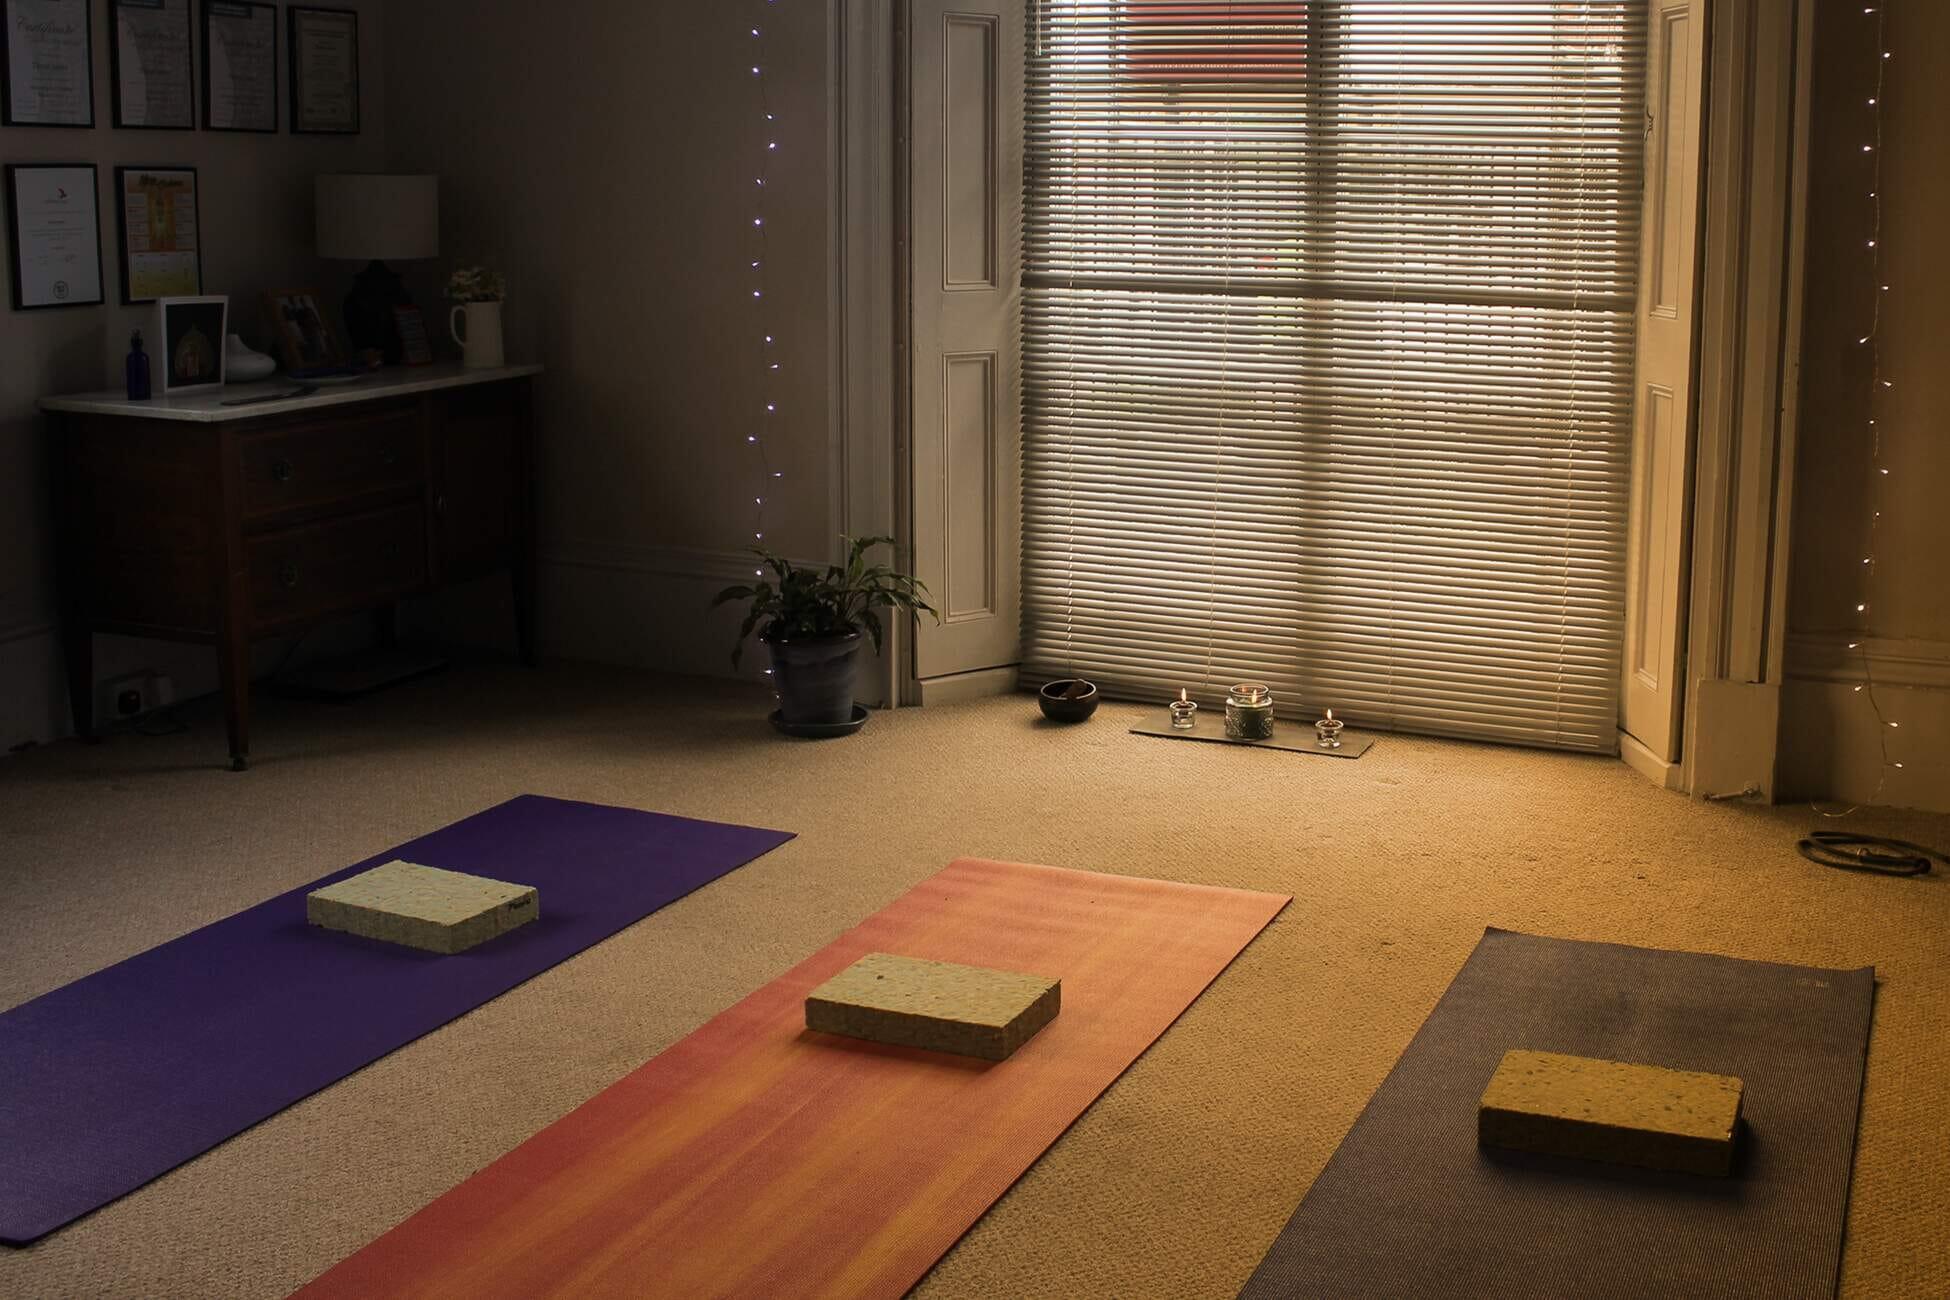 Yoga studio and mats